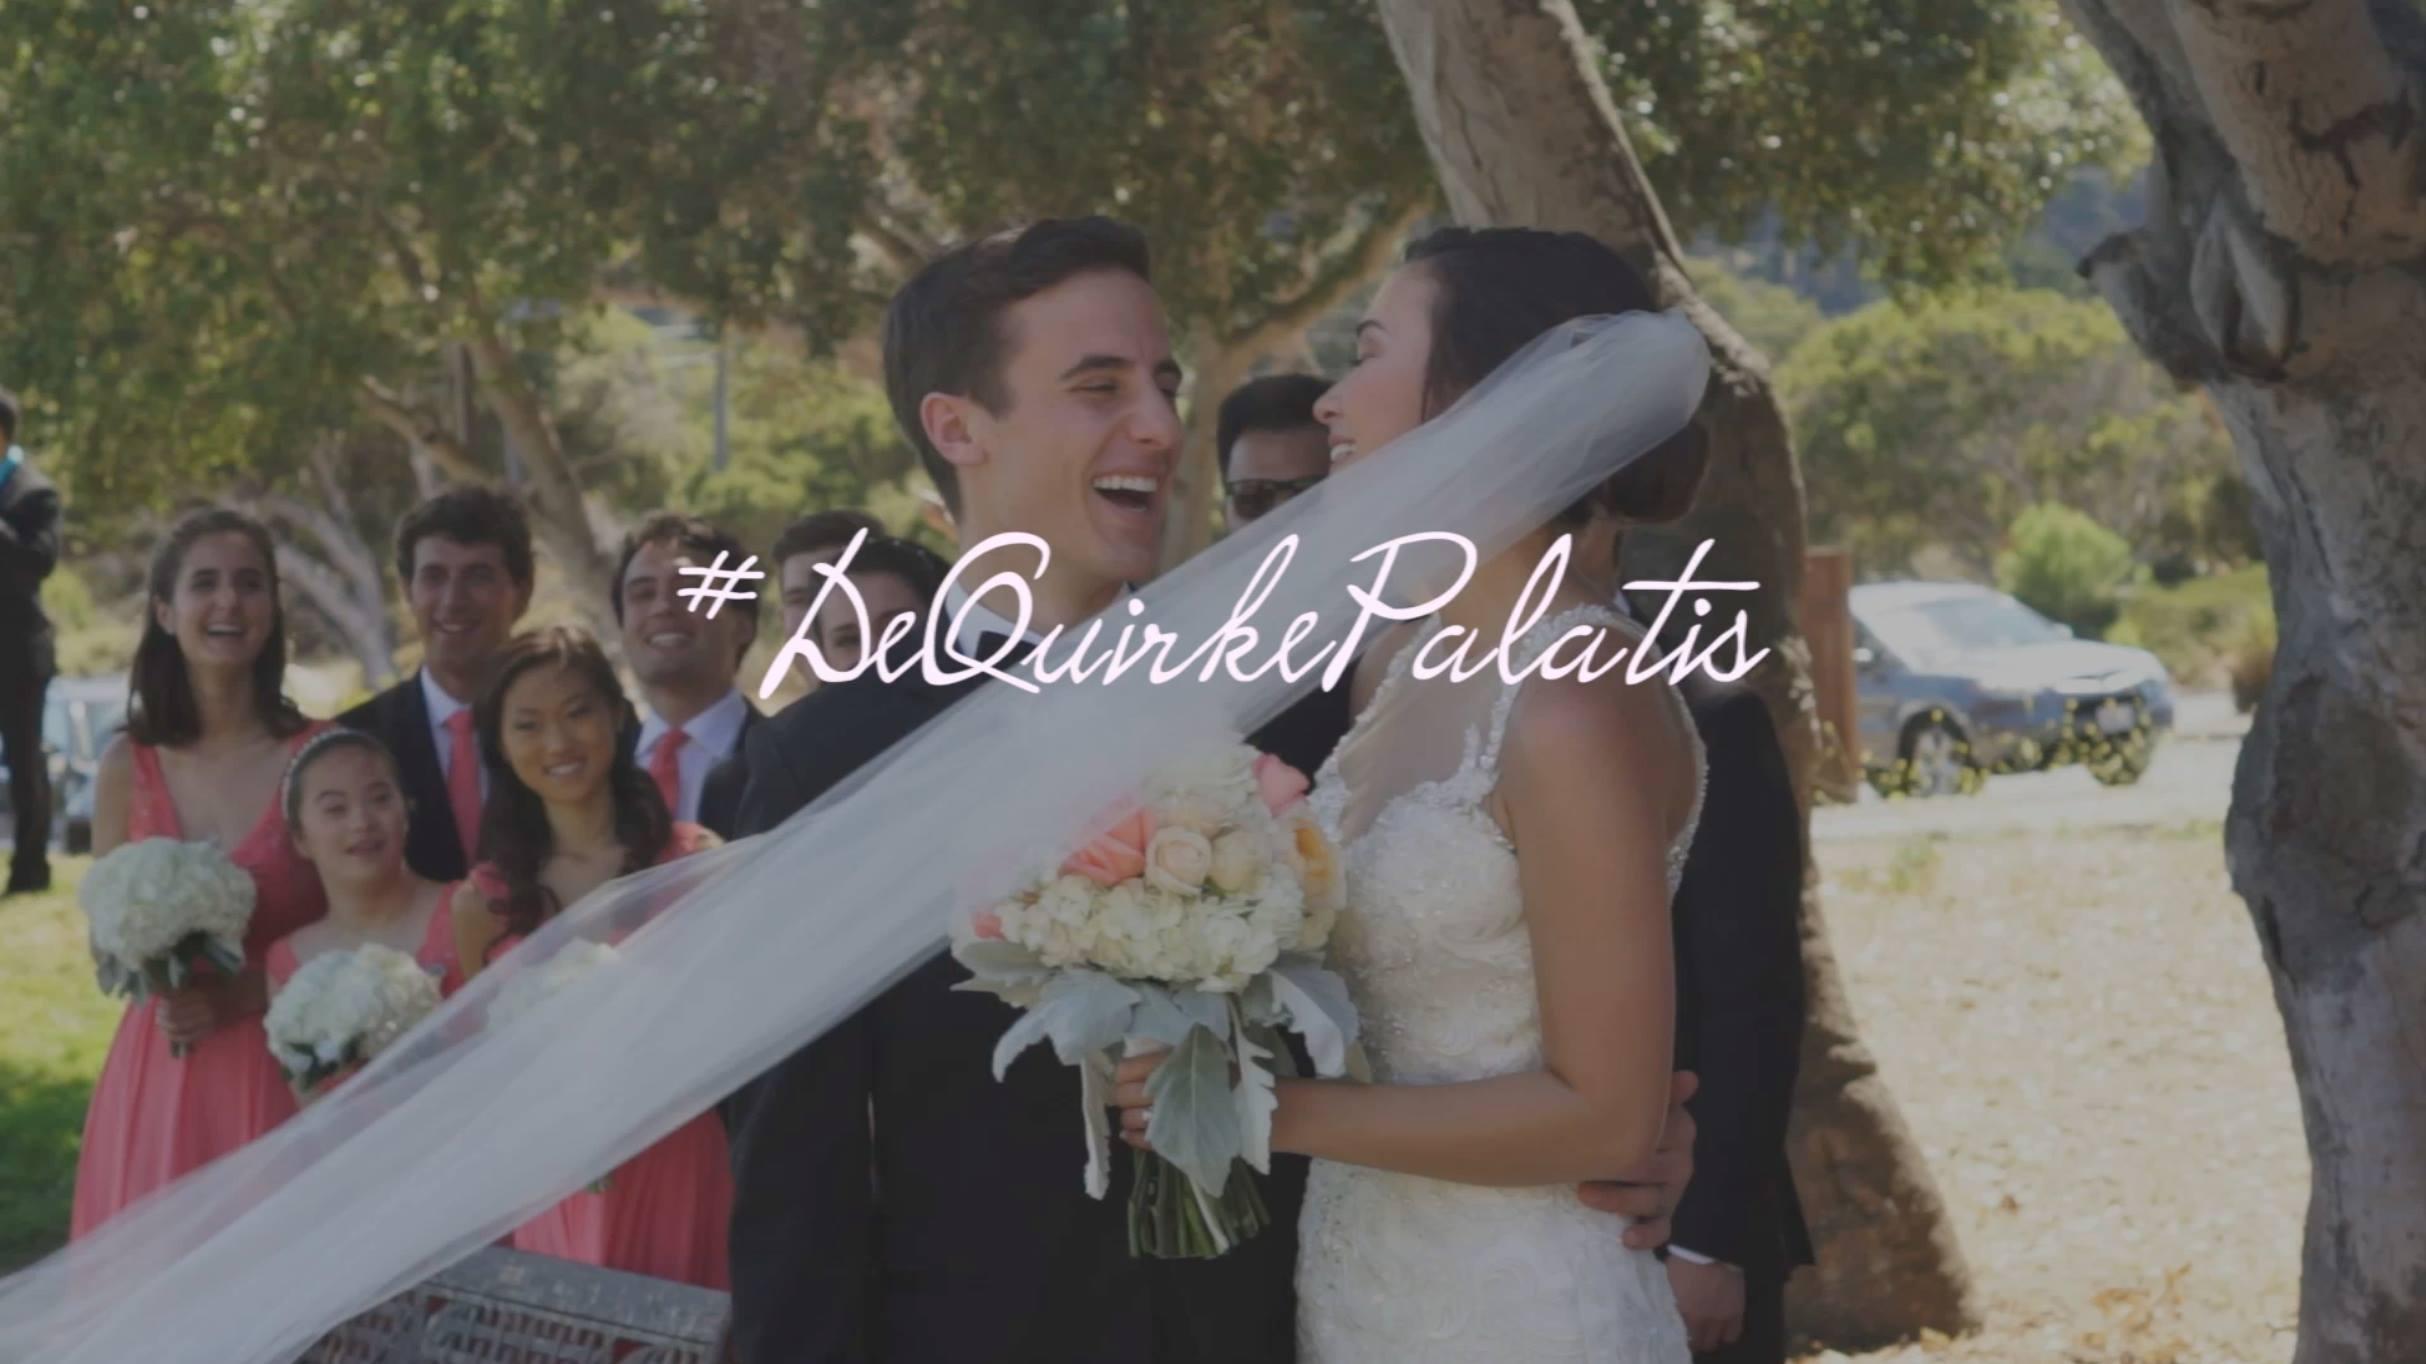 A DeQuirkePalatis Wedding